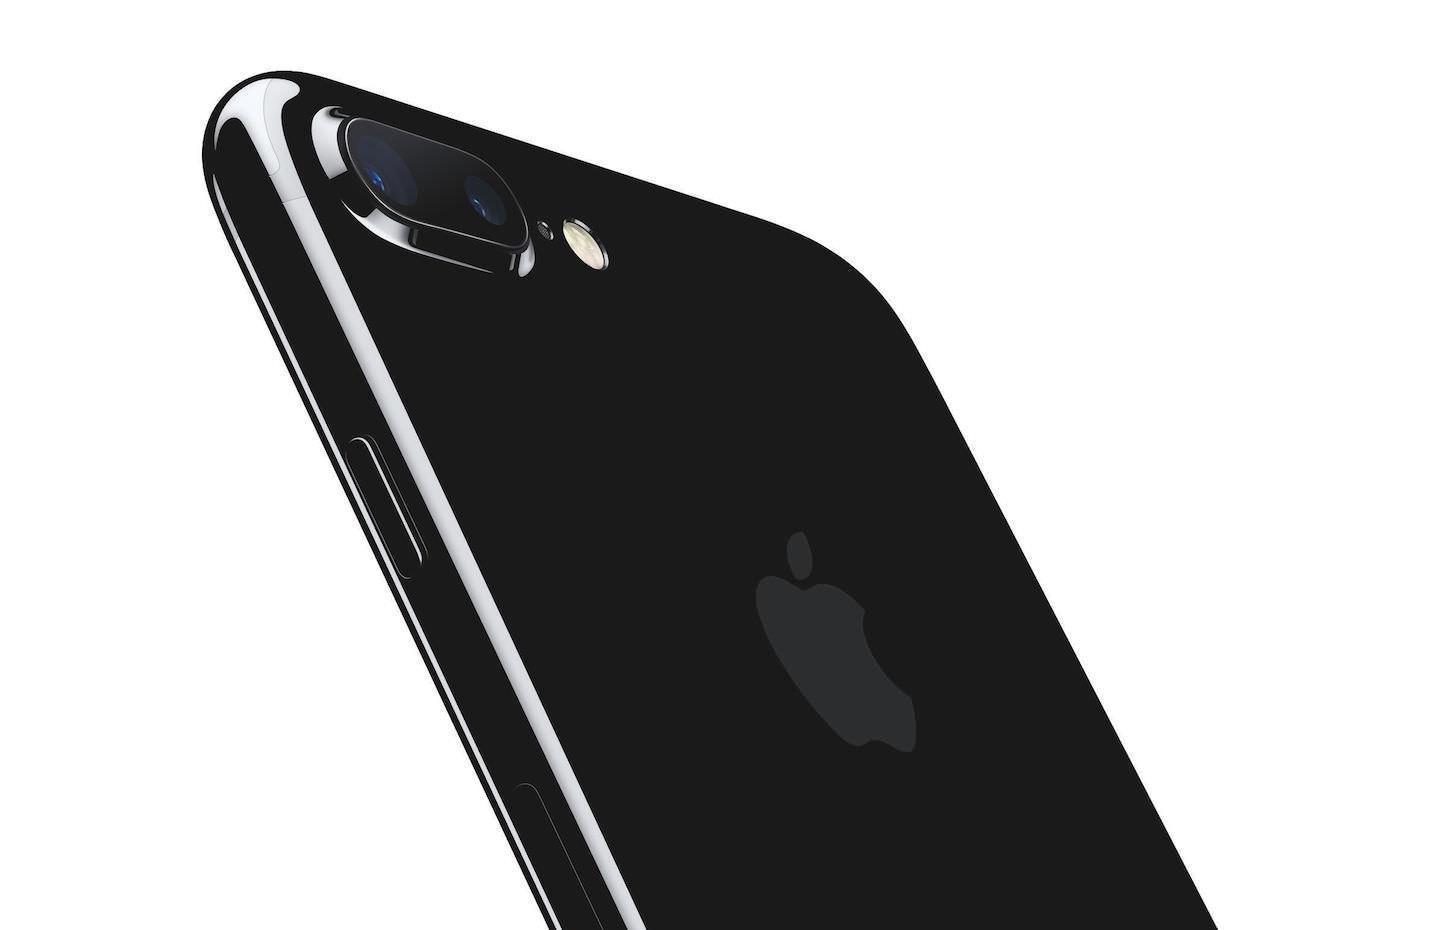 IPhone7Plus JetBlk 34BR LeanForward PR PRINT